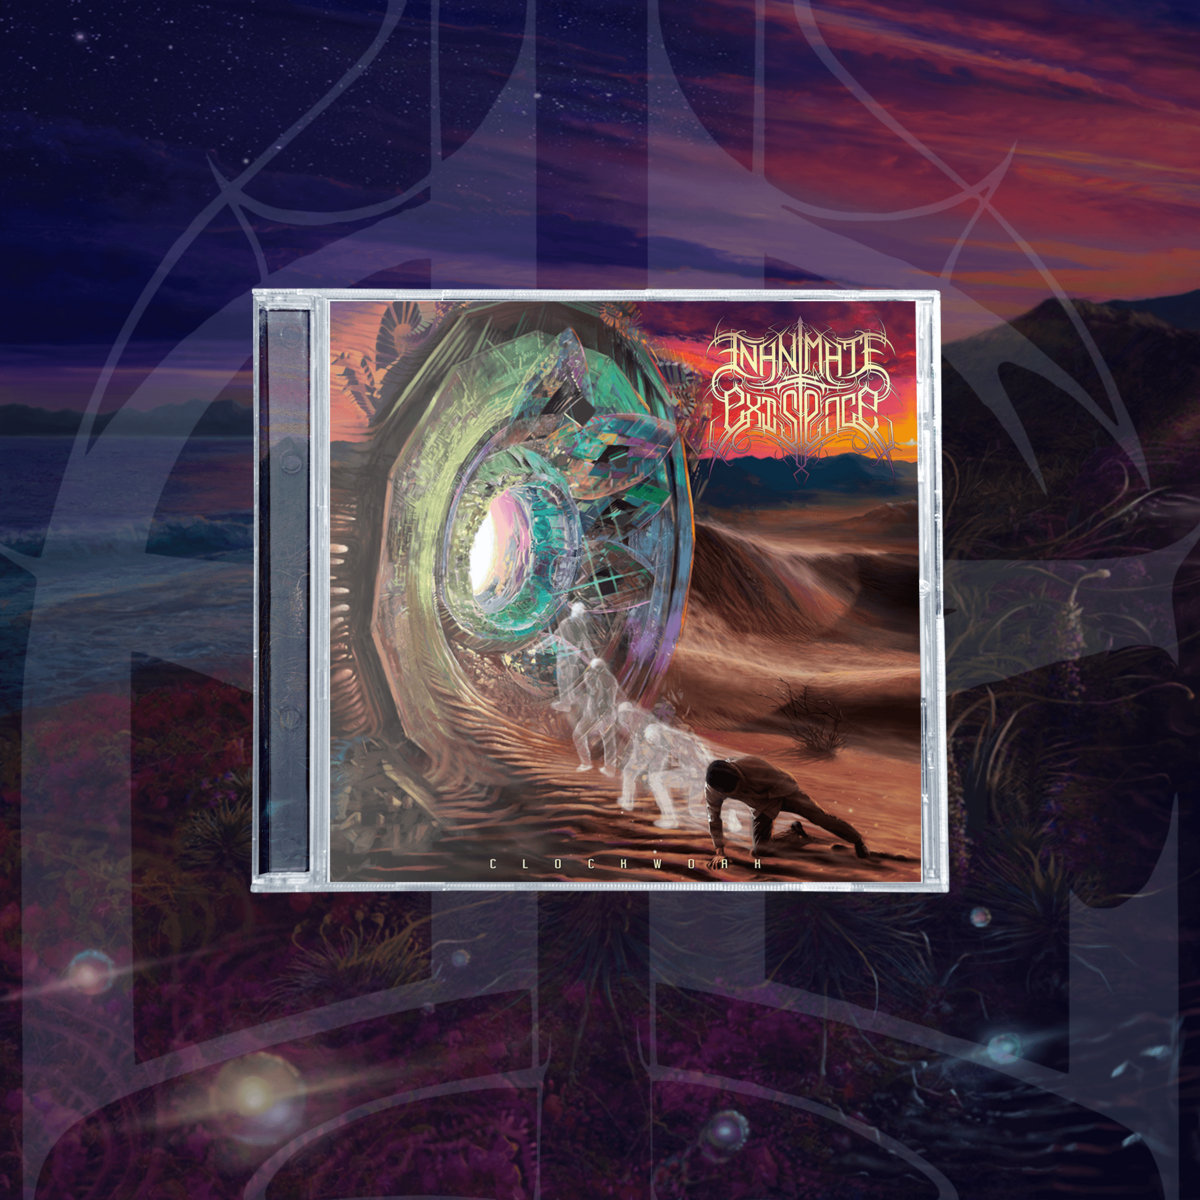 st lunatics free city album download